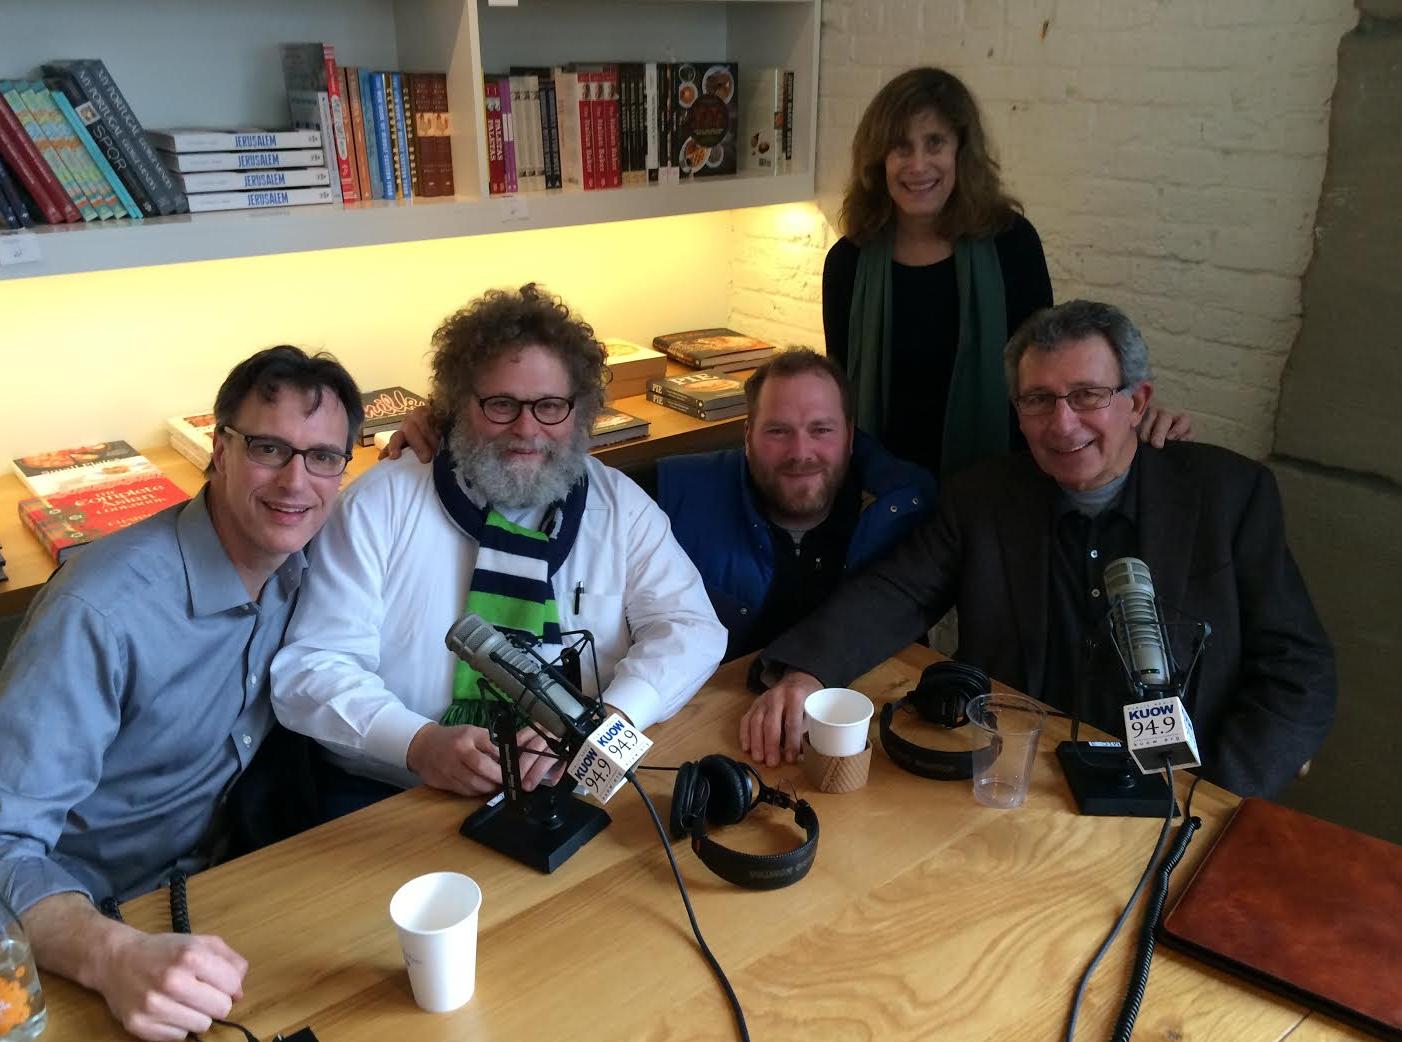 Dillon on the Week in Review Panel. [L-R] Host Bill Radke, Knute Berger, Matt Dillon, Joni Balter, former Seattle Mayor Charles Royer